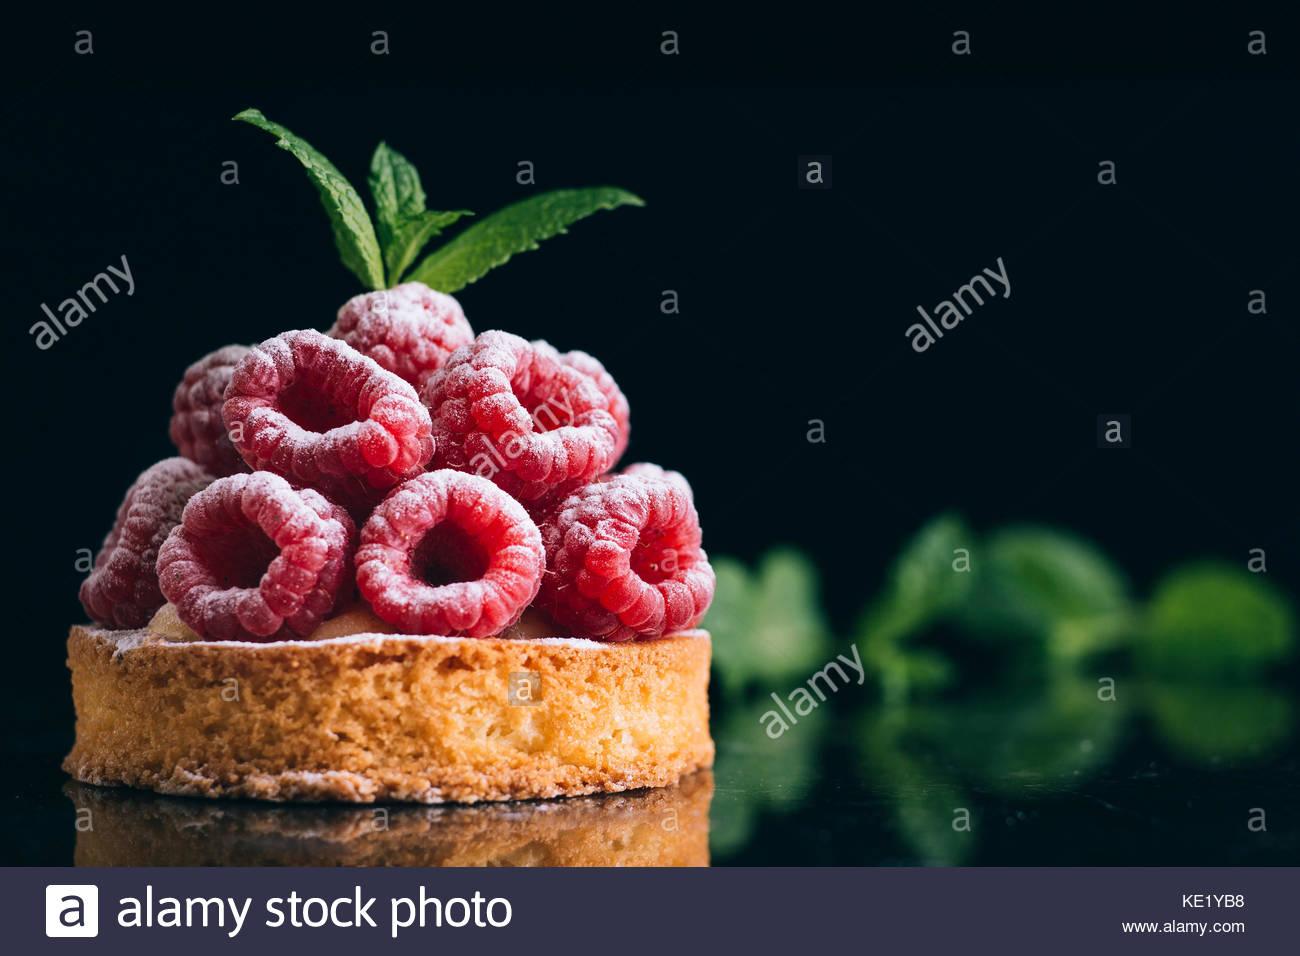 Raspberry tart dessert on dark background. Traditional french sweet pastry. Delicious, appetizing, homemade cake - Stock Image